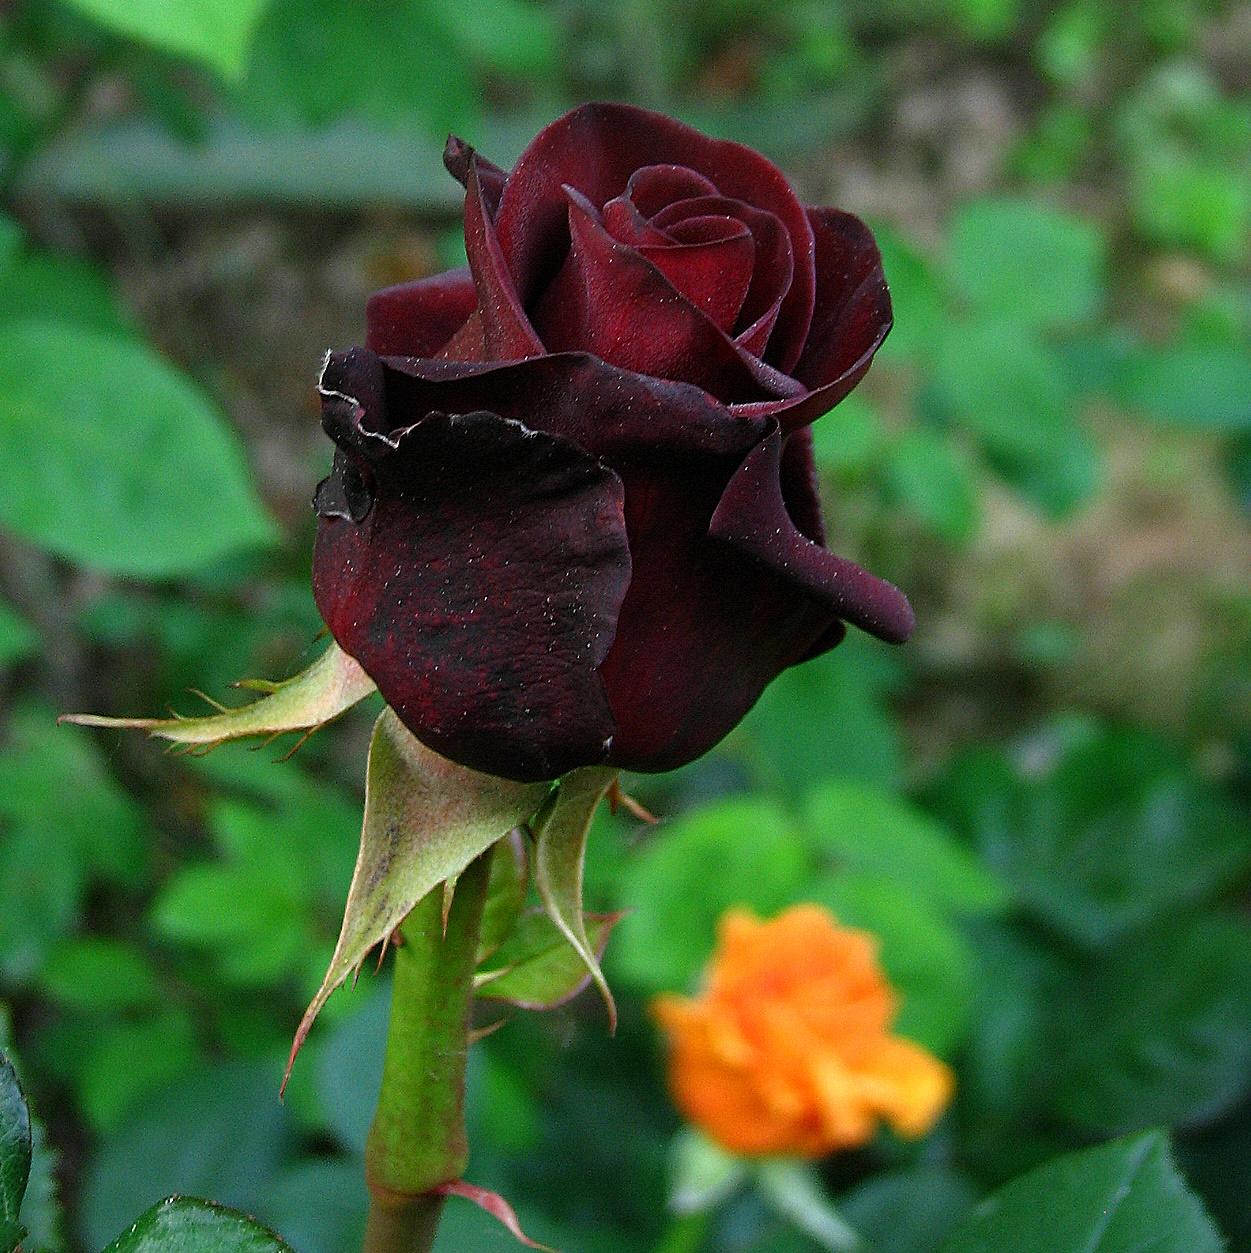 Lorto Dei Colori Rose Mattutine